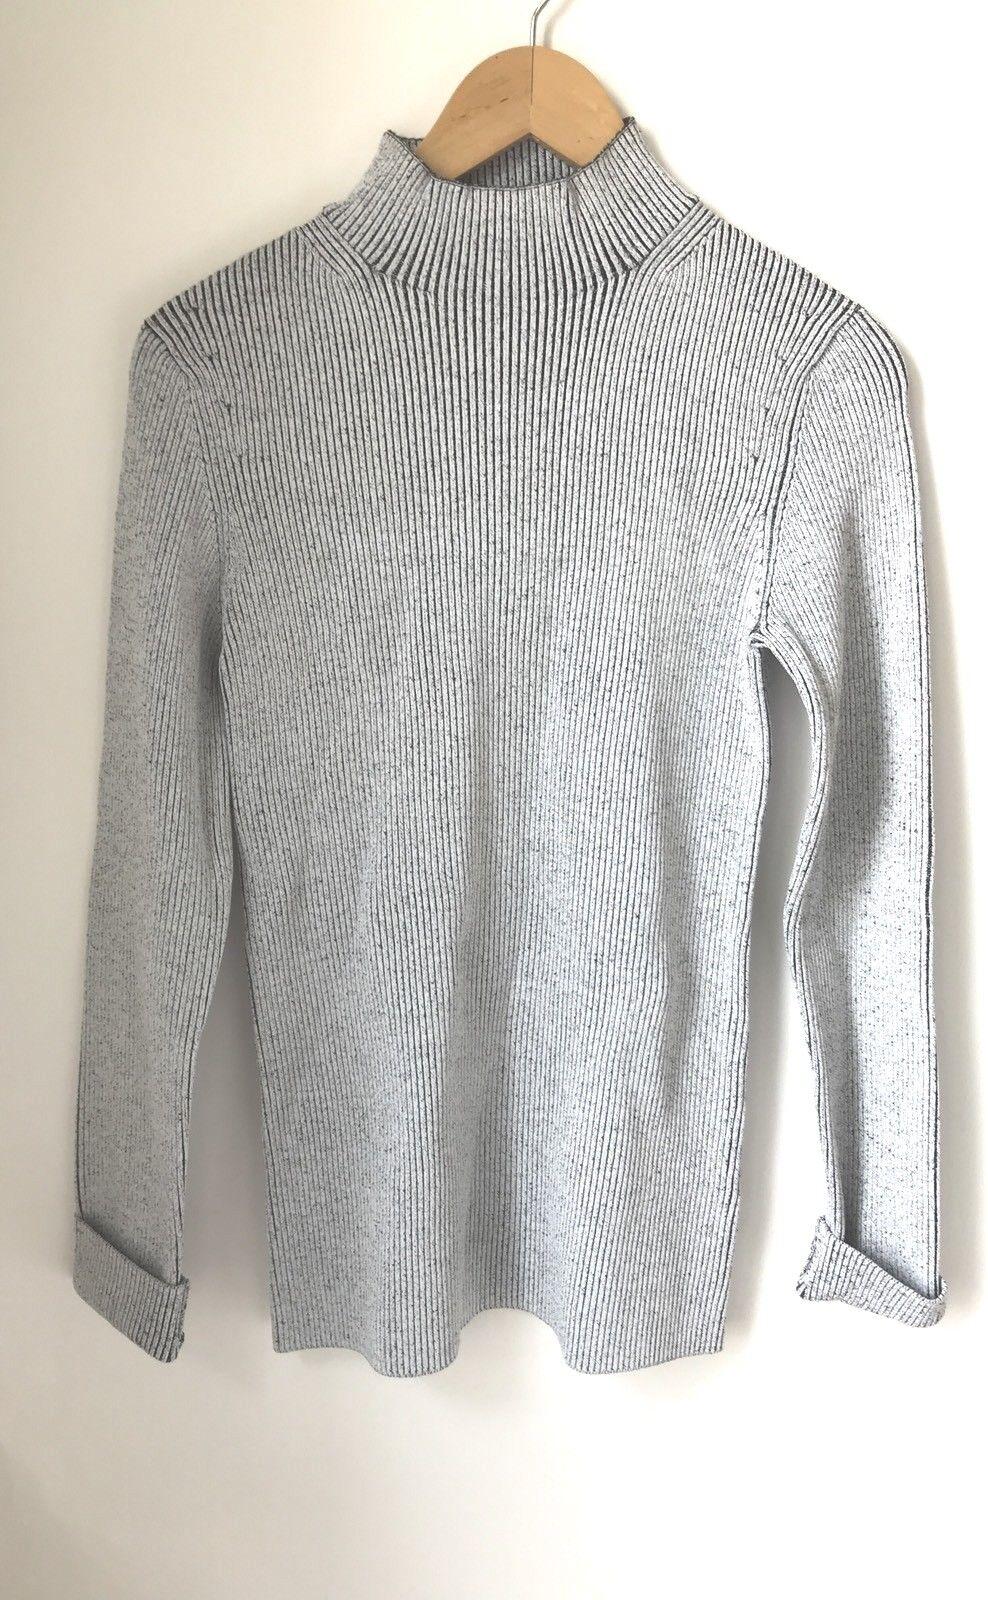 Proenza Schouler Large Grey Sweater